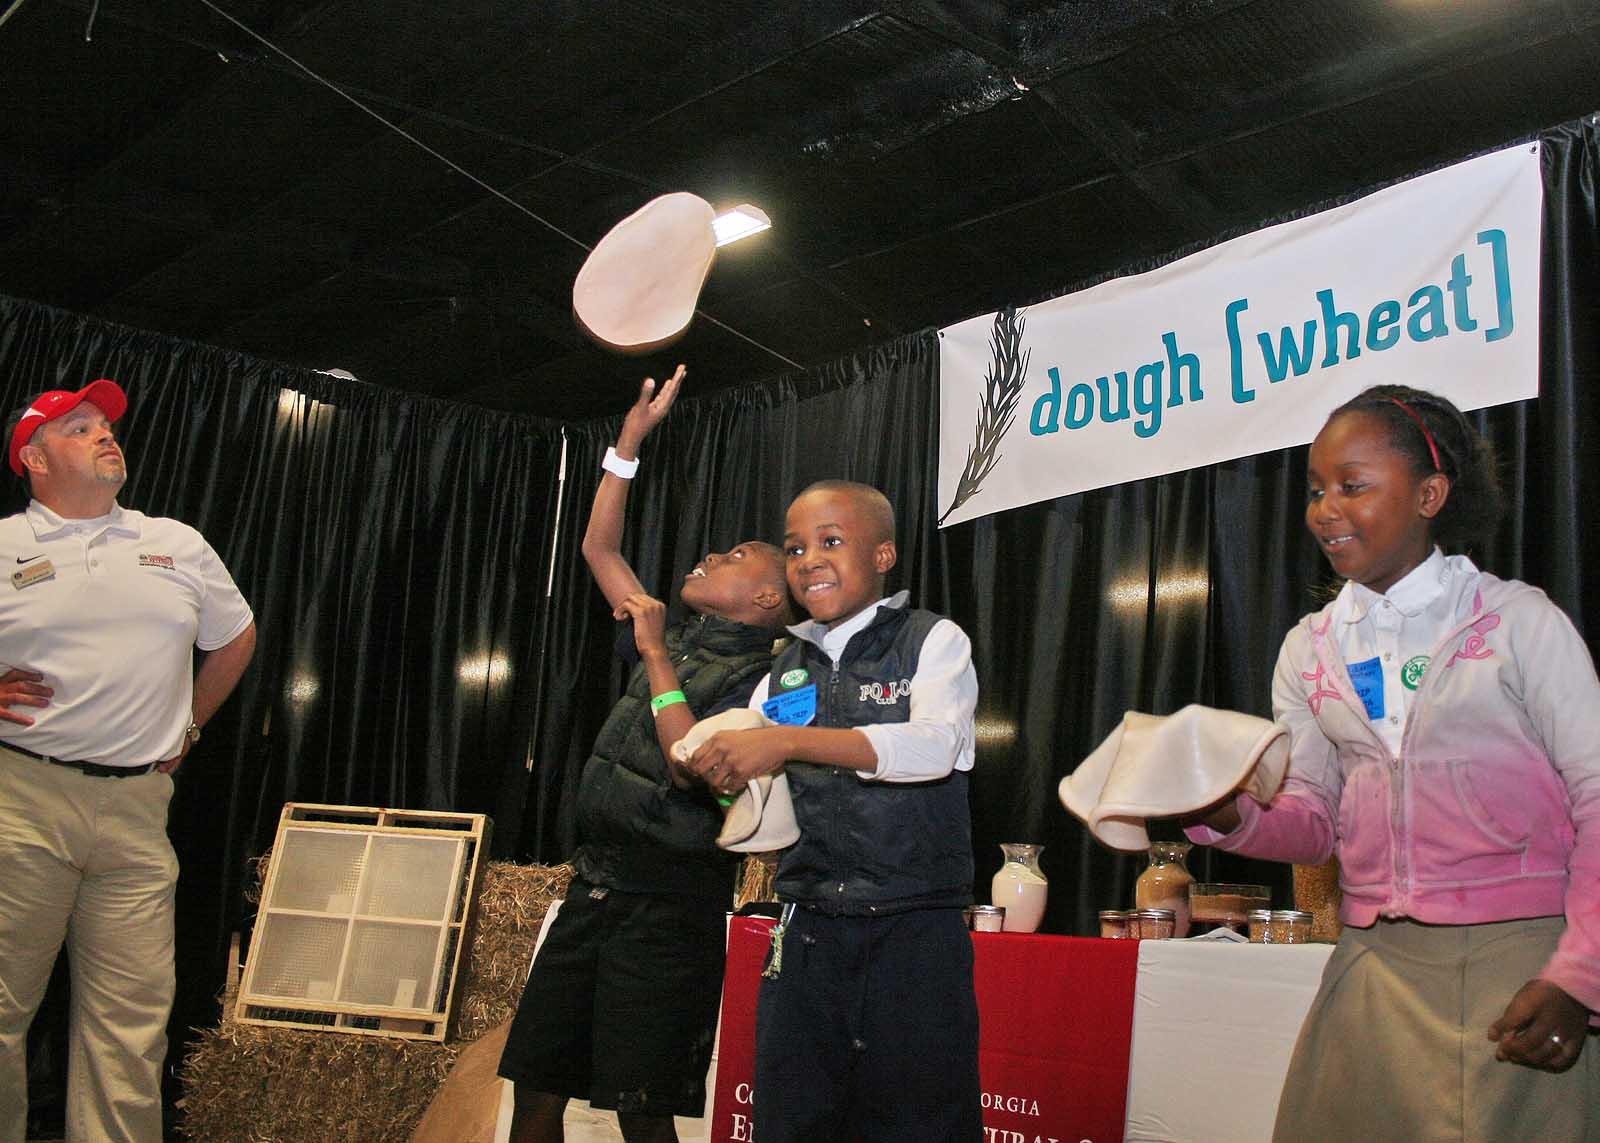 Tossing dough